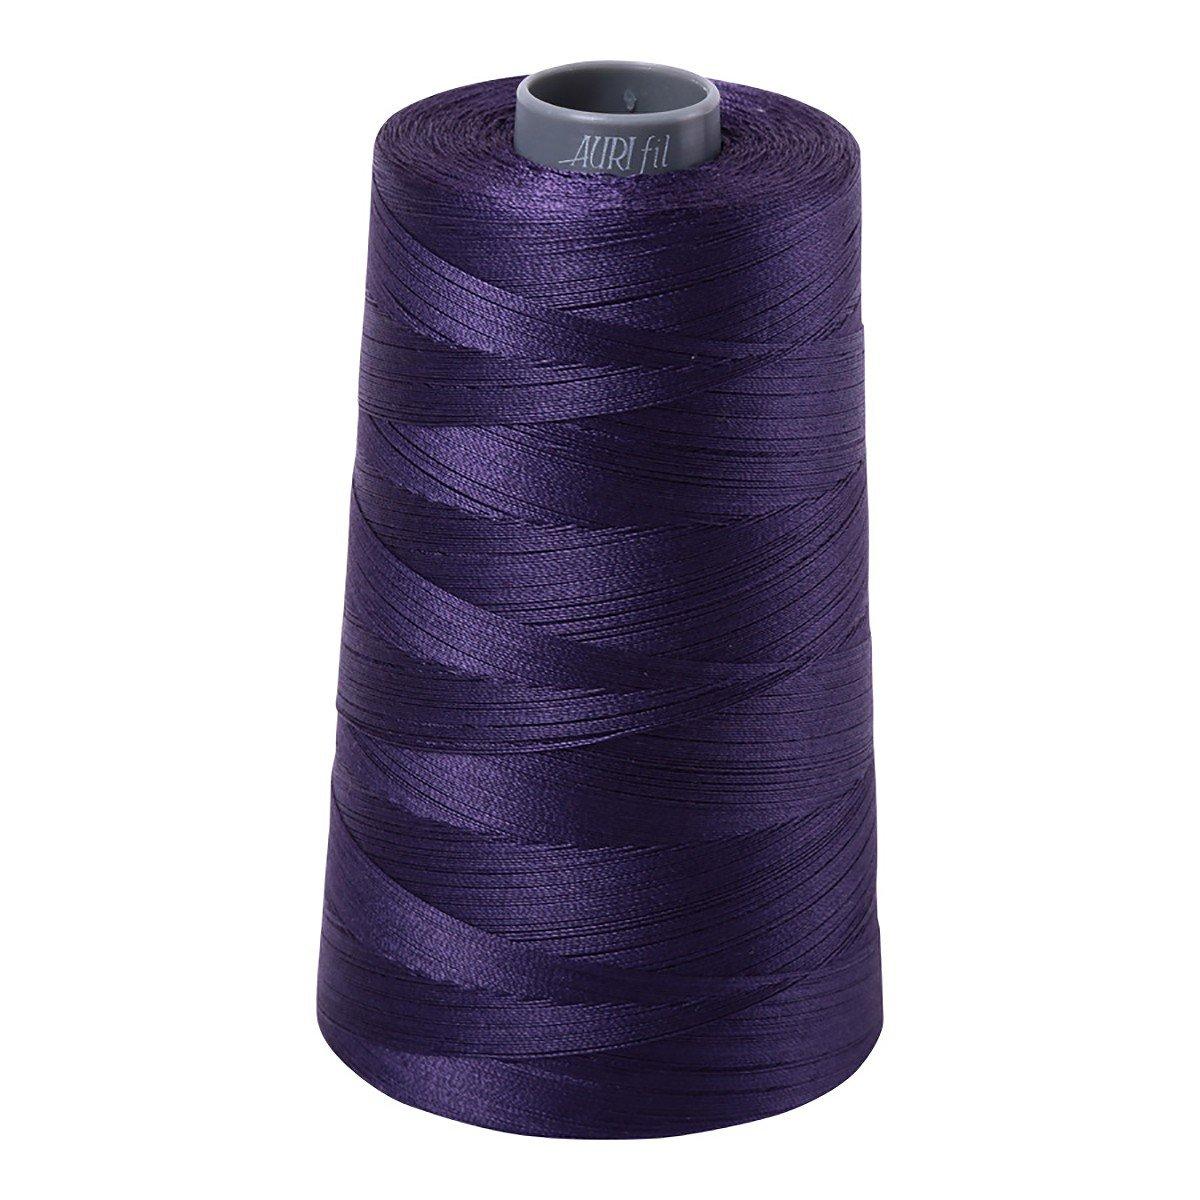 Mako (Cotton) Embroidery Thread 28wt 3609yds Dark Dusty Grape